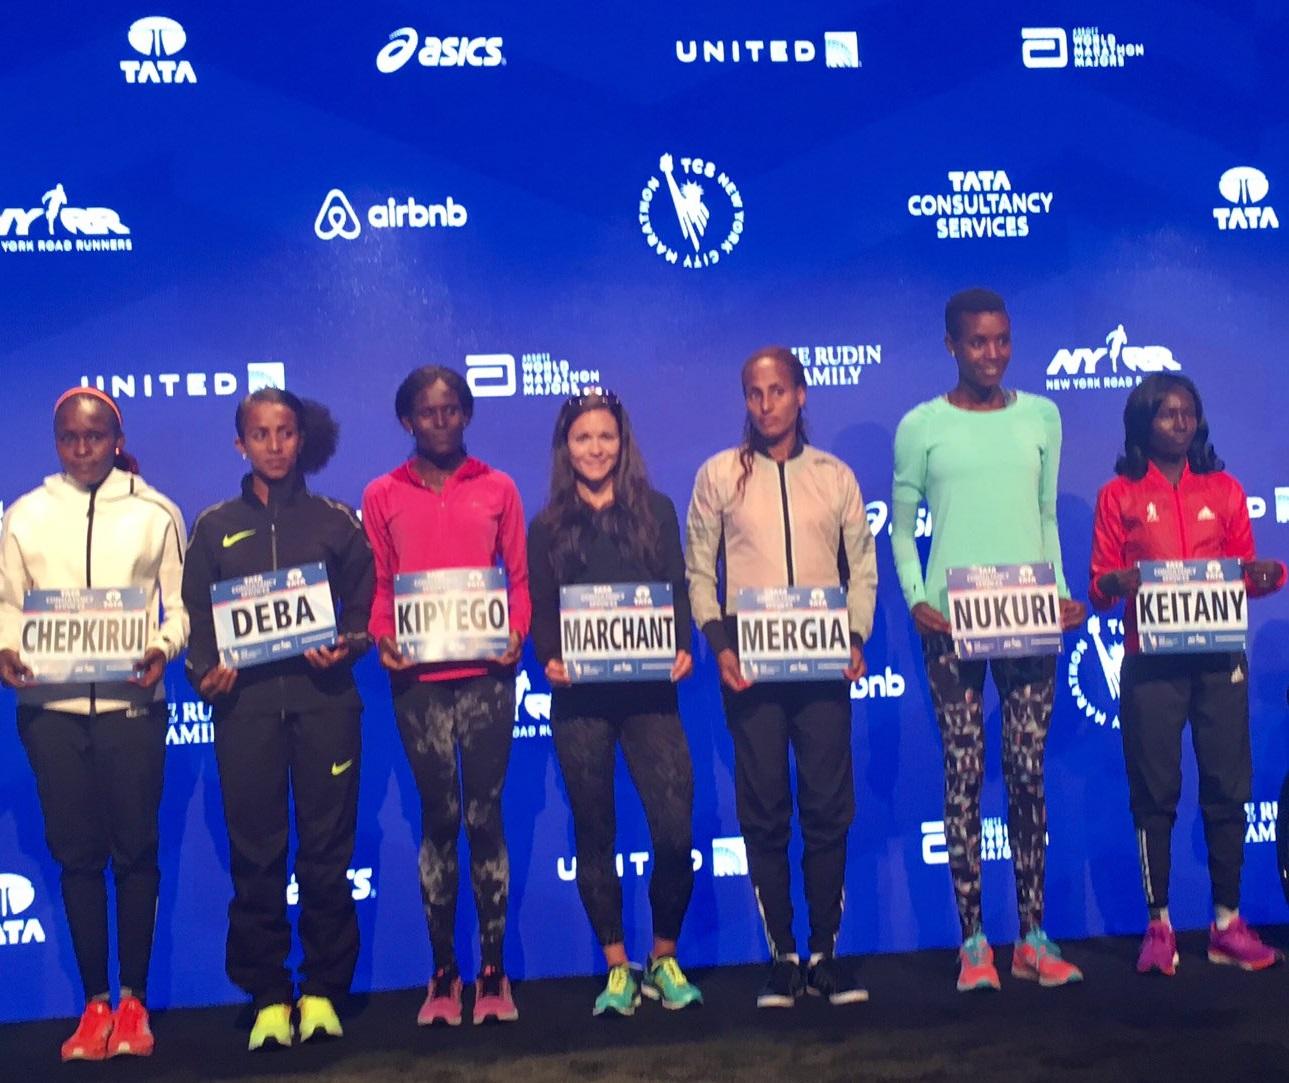 tcs-new-york-marathon-2016-women